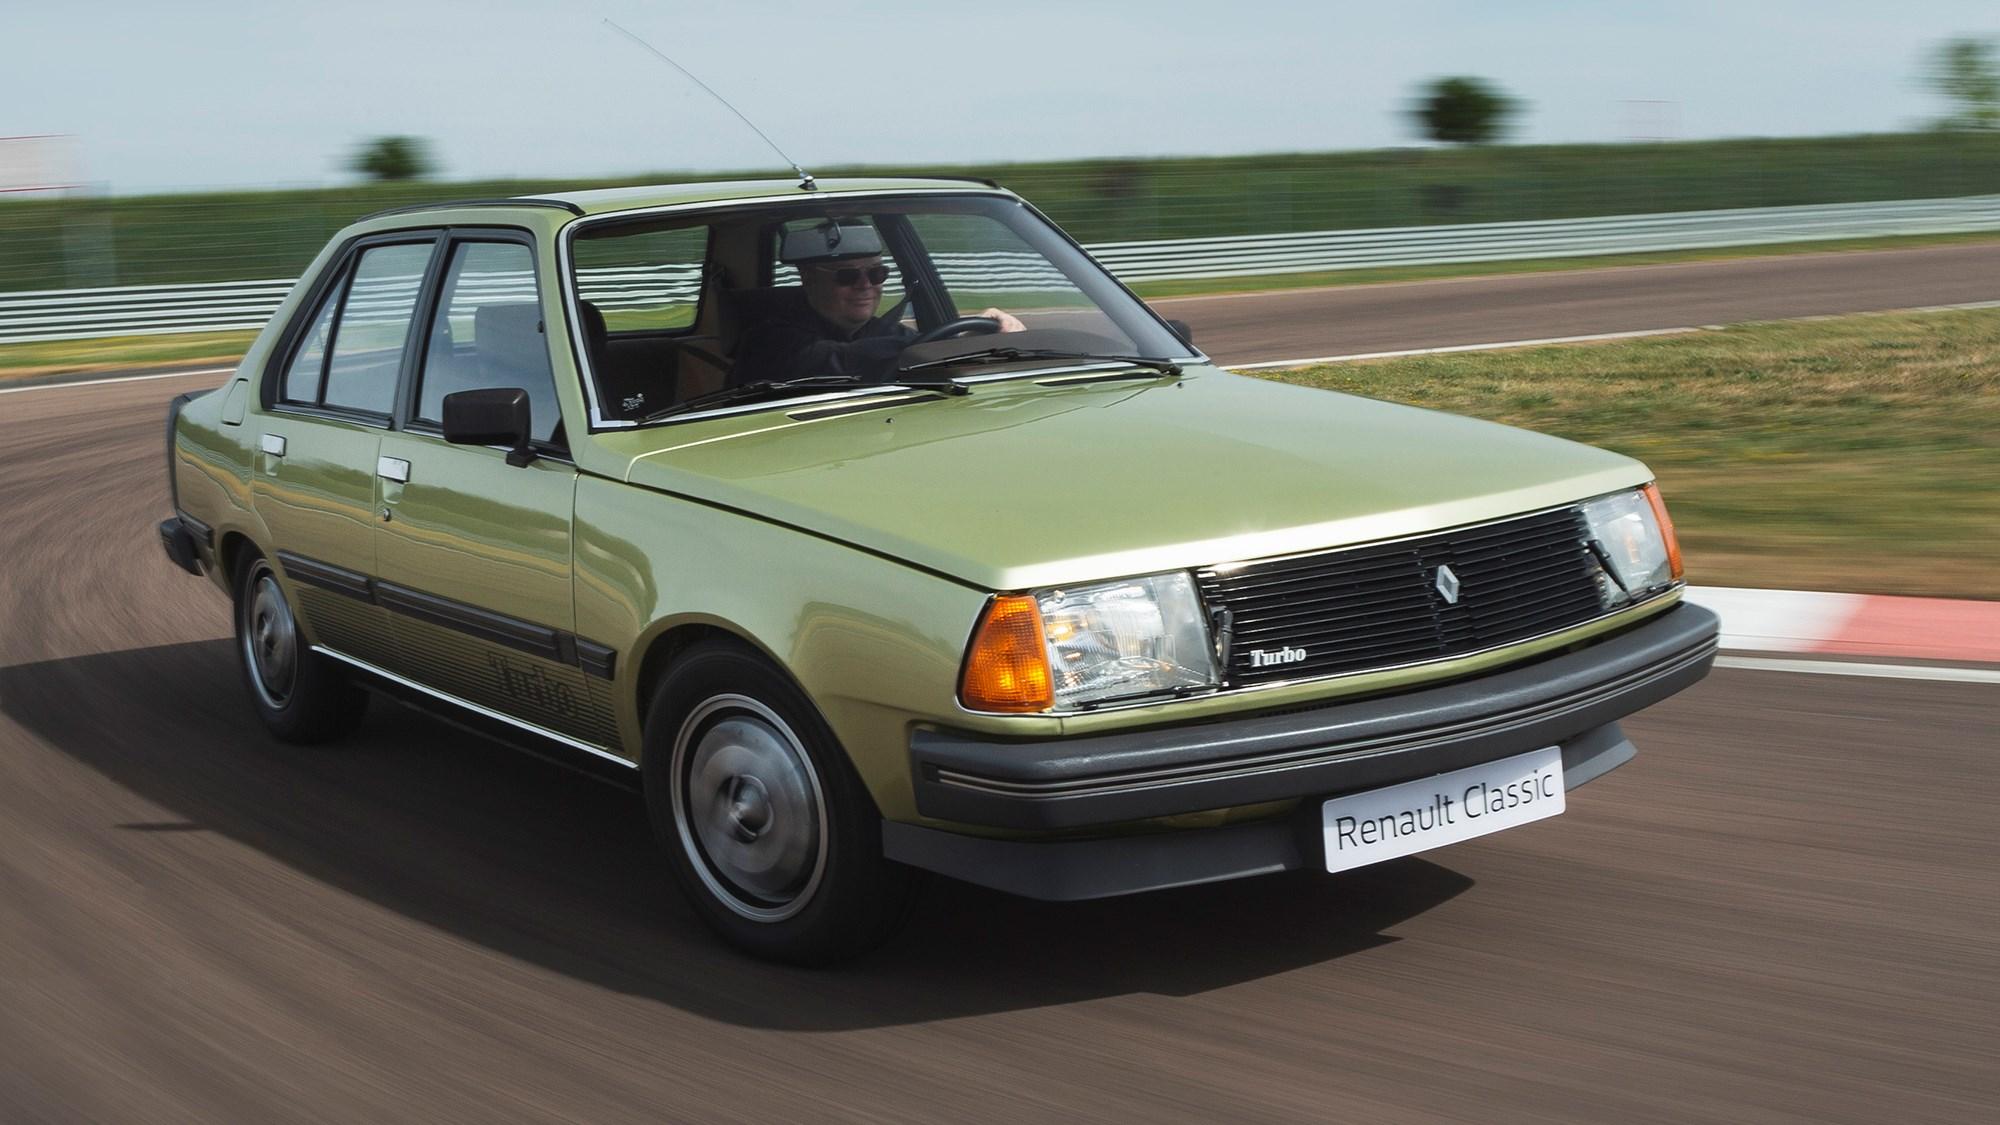 Renault 18 Turbo front cornering shot